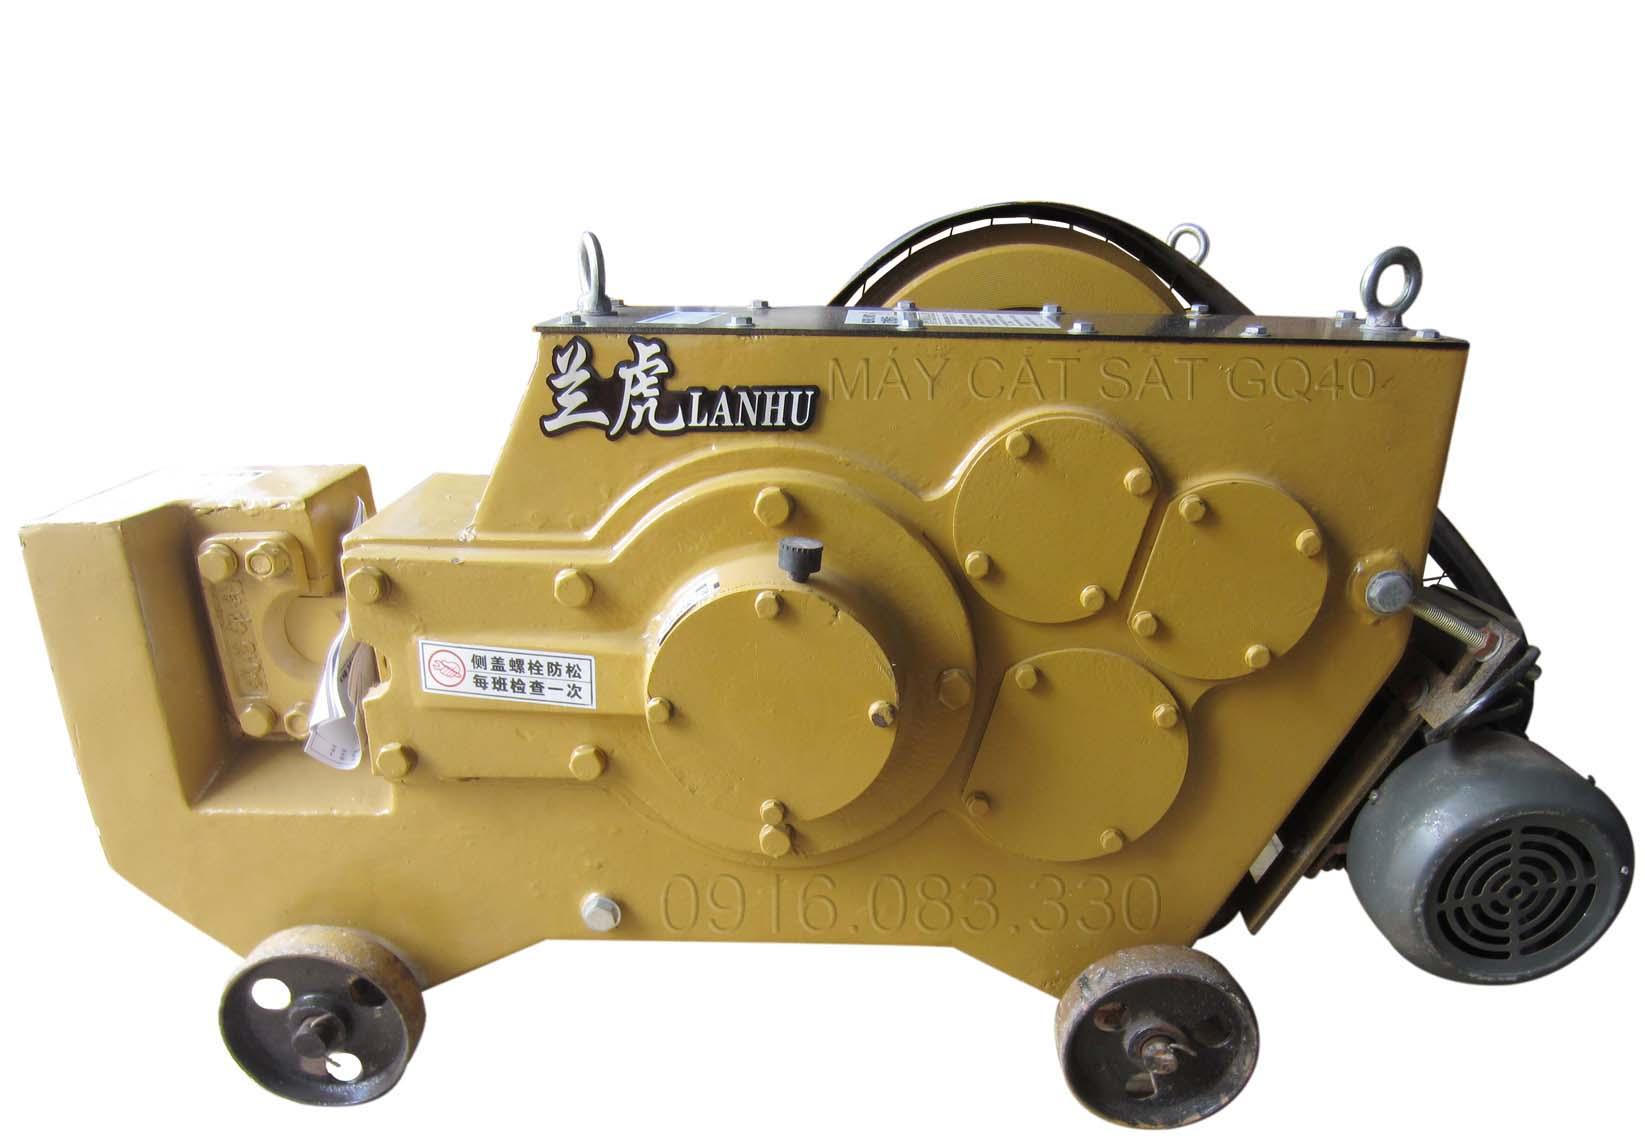 Máy cắt sắt Gute GQ40 - 3 pha 380V